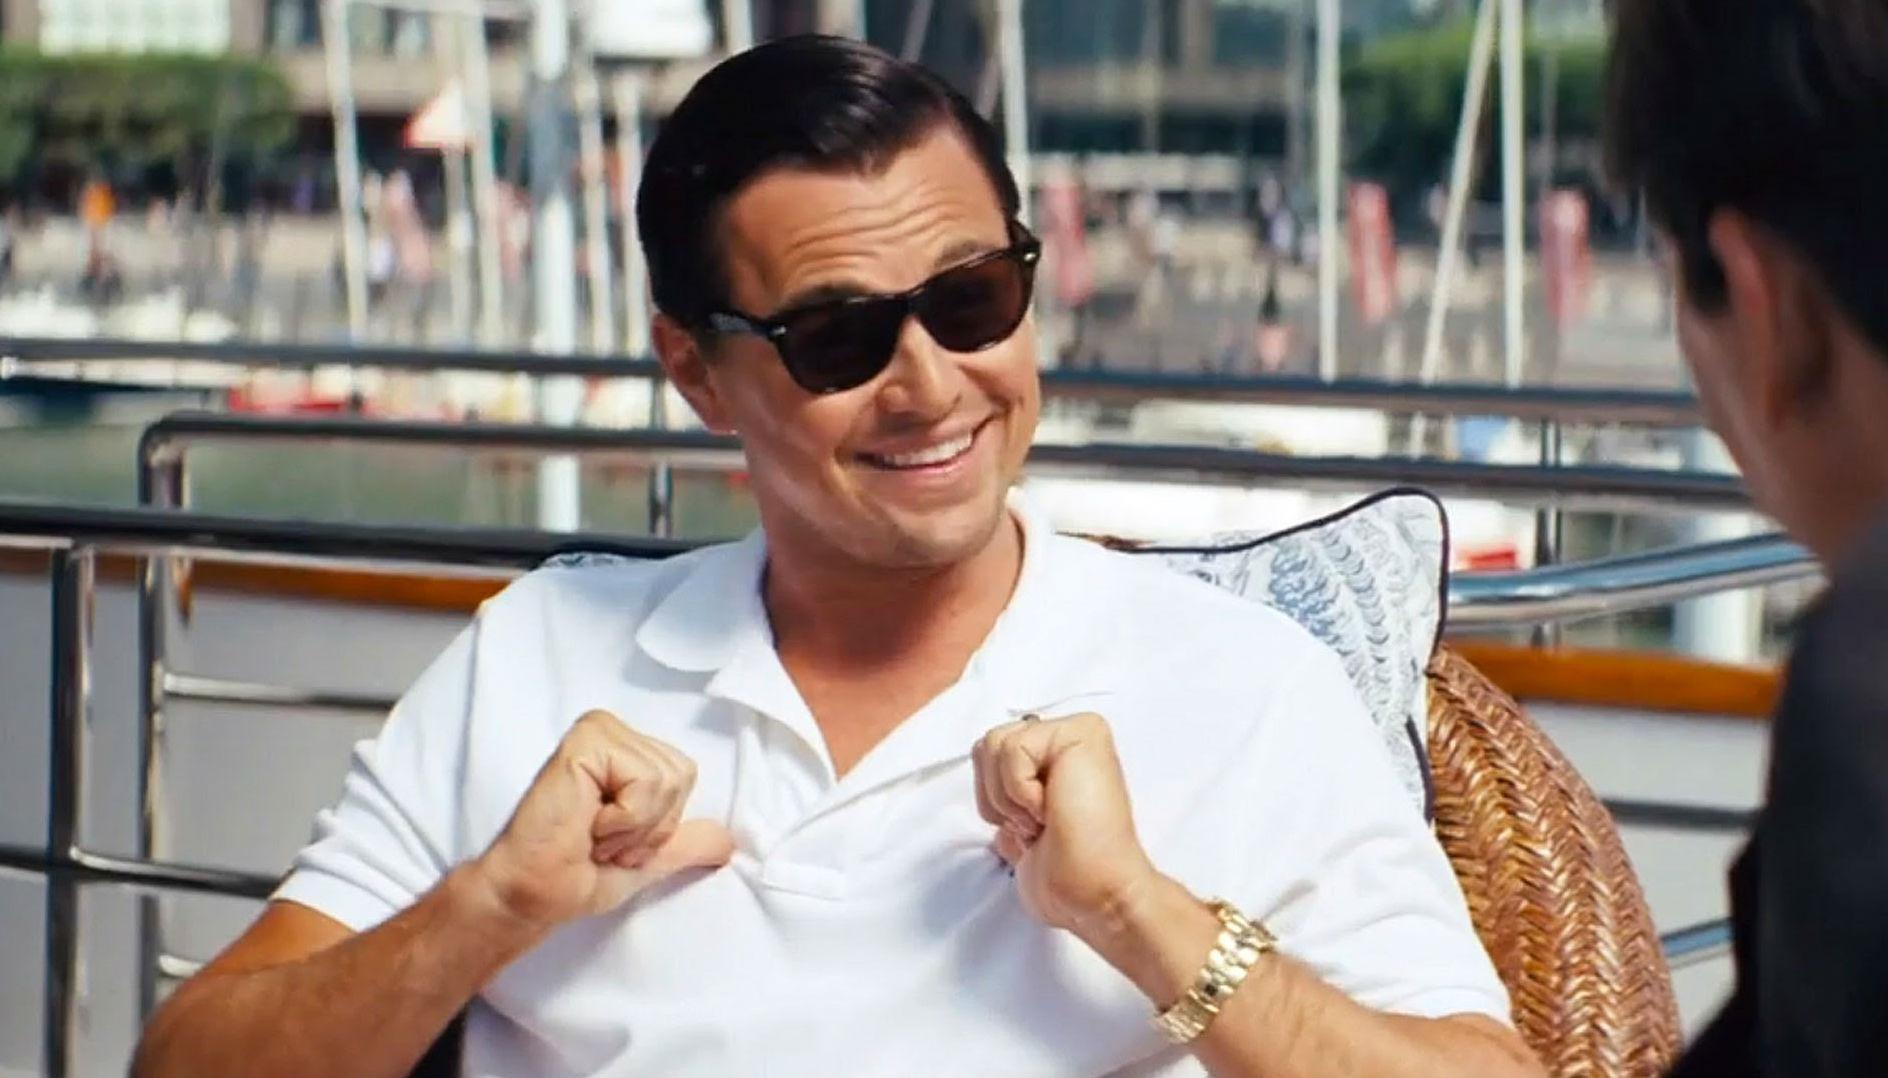 Zie Jij Het Verschil Tussen Leonardo Dicaprio En De Zoon Van Jack Nicholson Jfk Apparently nicholson didn't think dicaprio was scared enough of him in the scene, so he raised the stakes the following day. zoon van jack nicholson